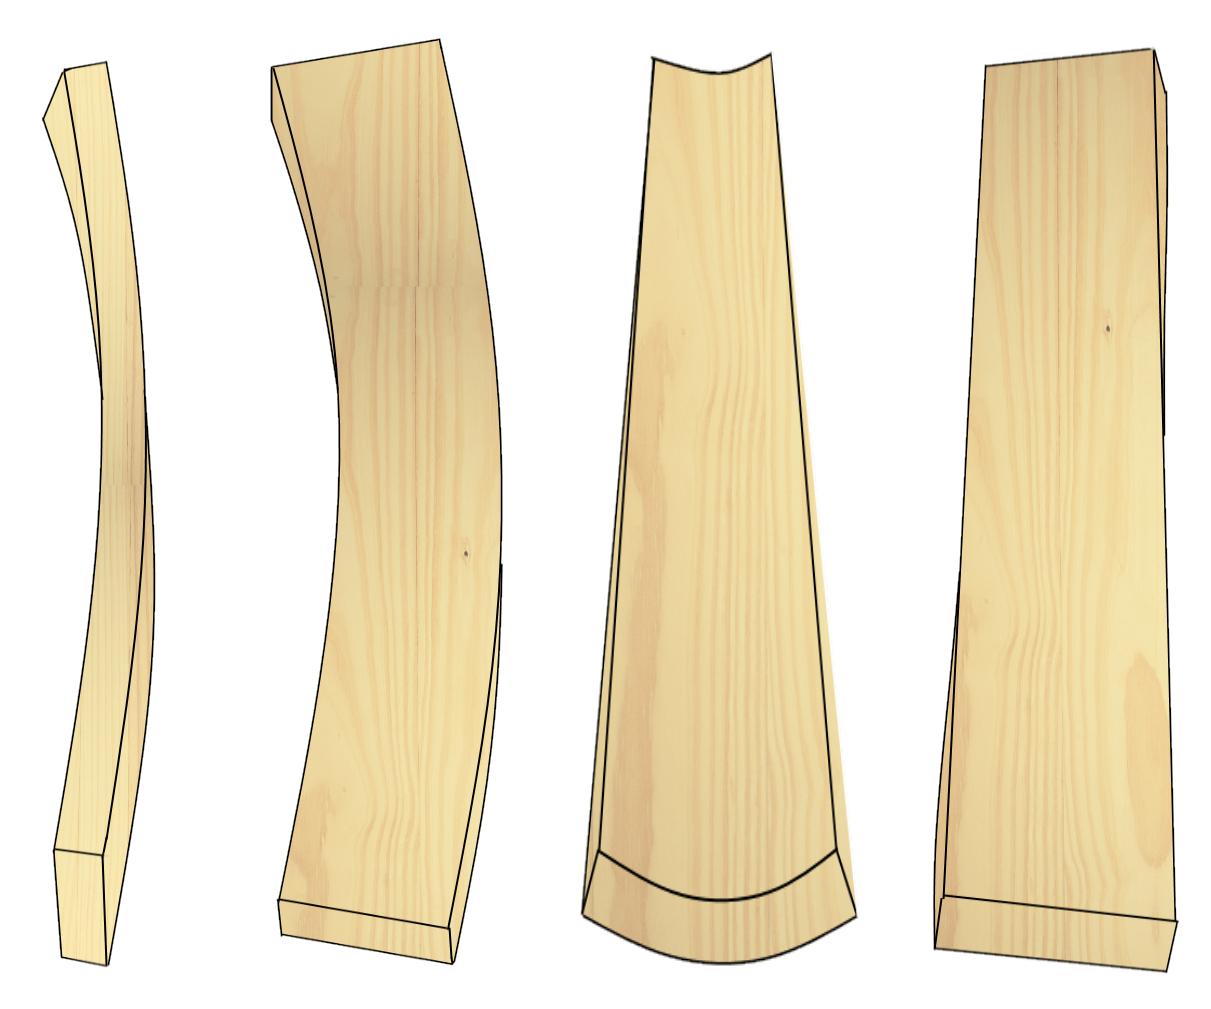 Dimensioning Lumber